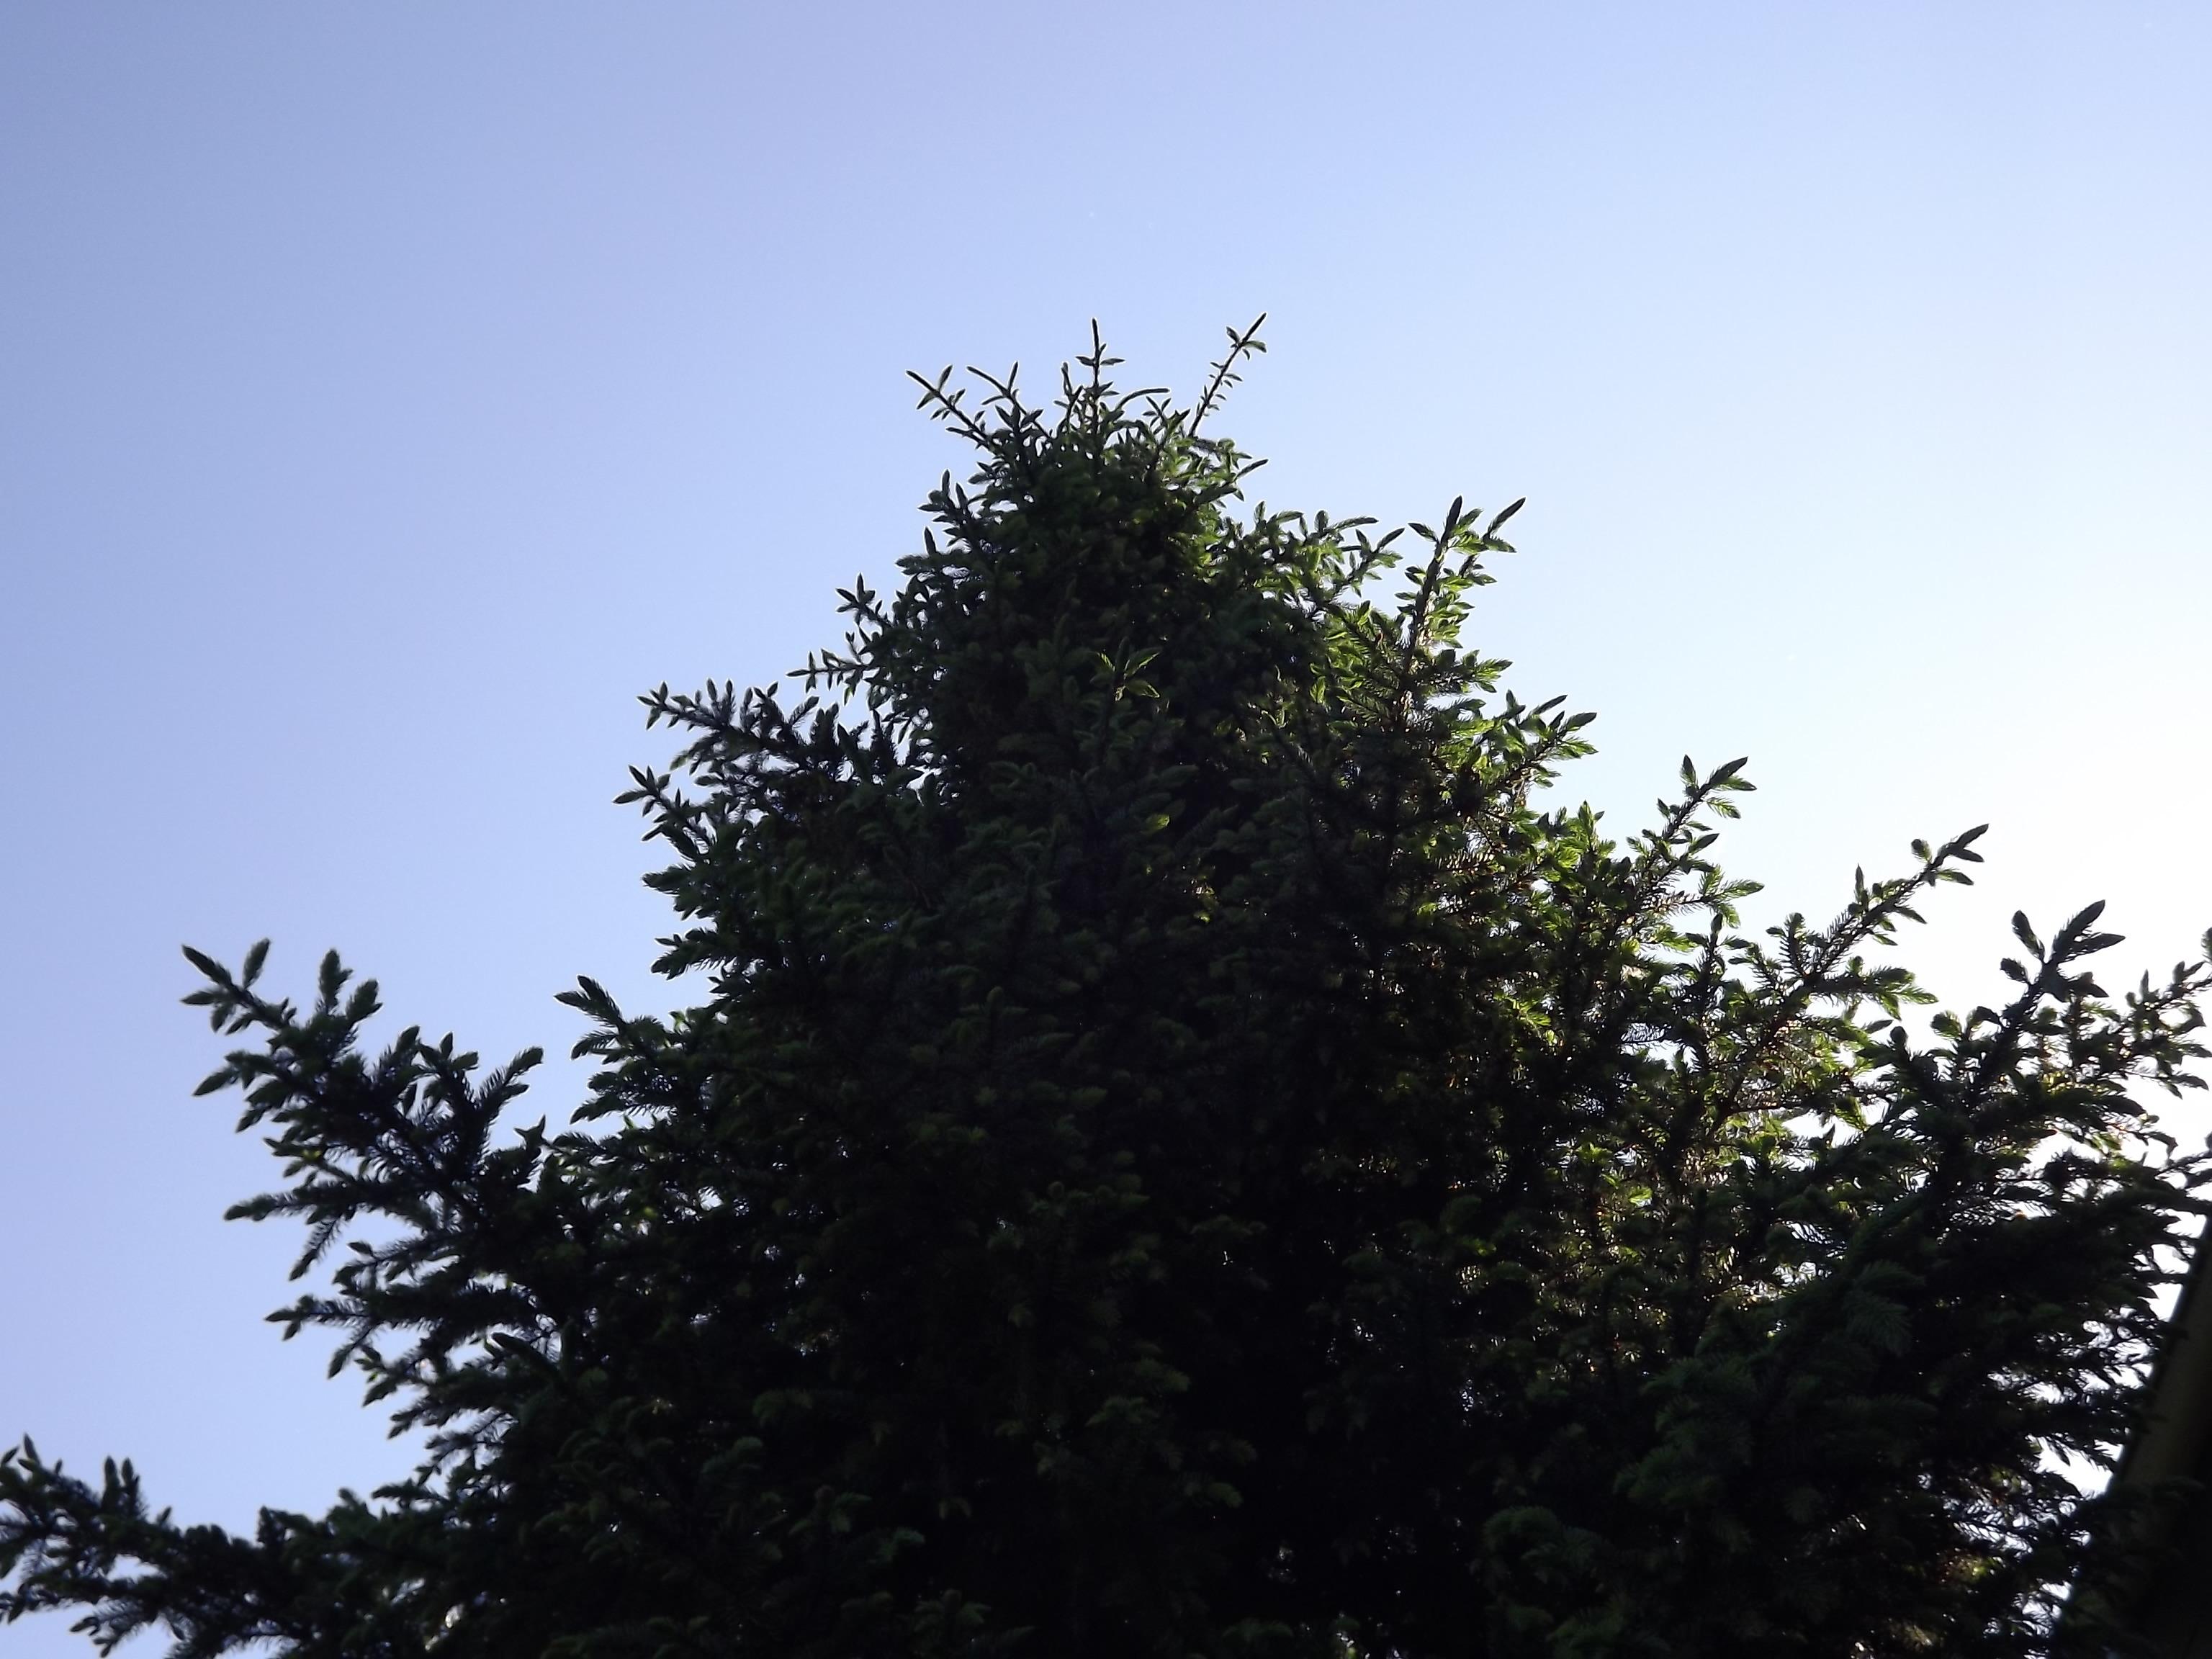 6125-tanne-himmel-blau